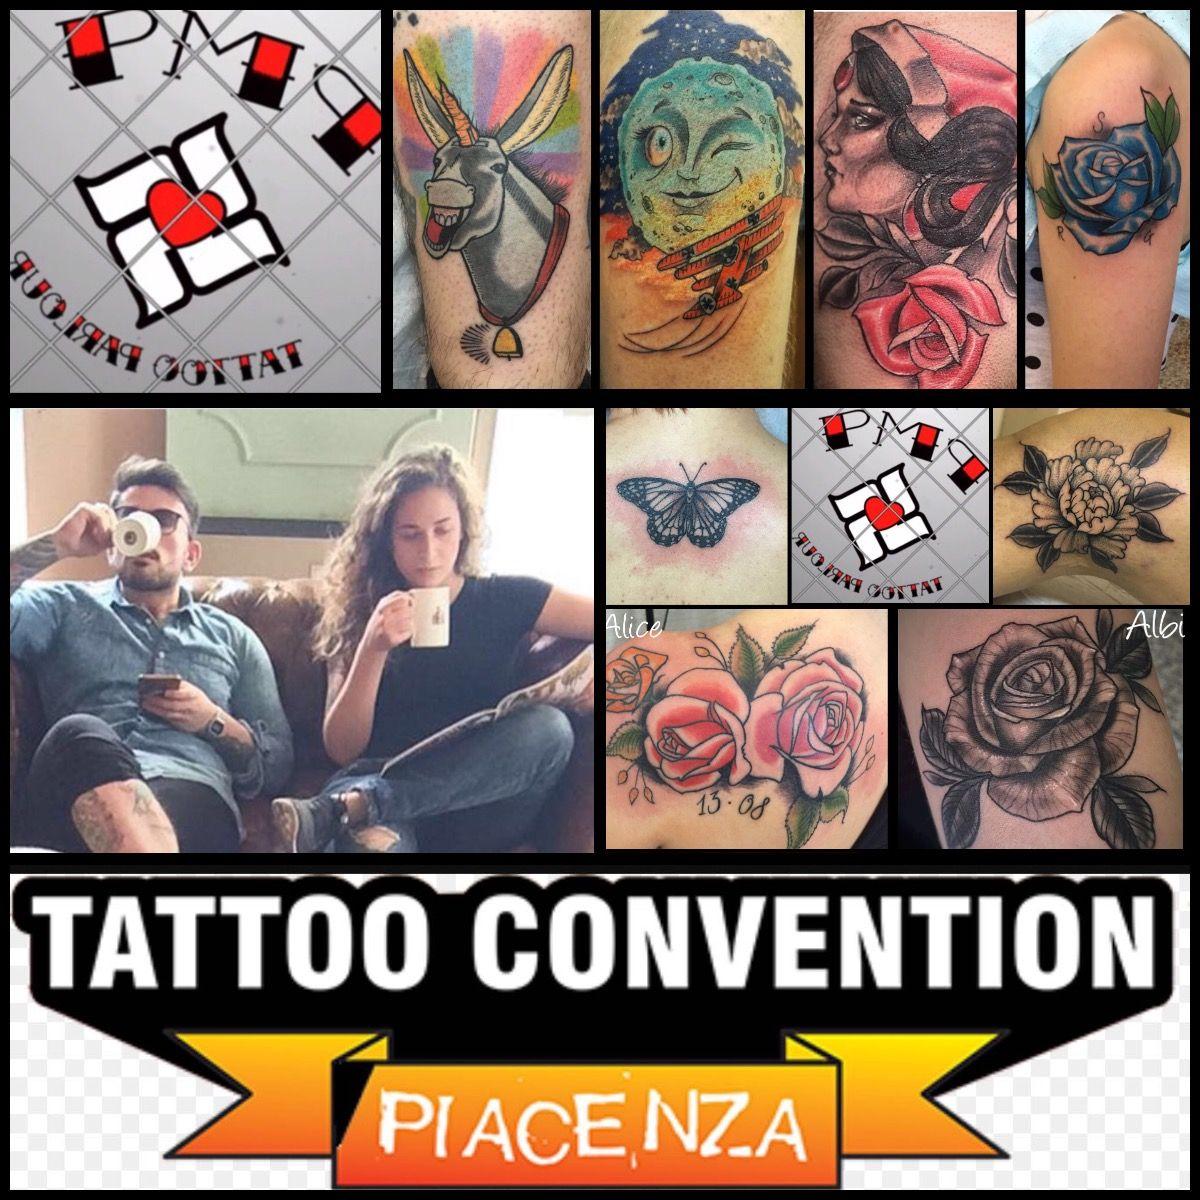 Saremo presenti alla Convention di Piacenza per info e app. contattateci o passate in studio mix#tattoo#tattoos#tattooink#ink #love #instagood #lovetattoo #special #amezing #convention #yes#instacool #facebook #blackandwhite #piacenza #socool #tattooblack #sky #yes #instagood #instacool #color #picoftheday #photooftheday #pic @one_tooth_three @albi_pmp_tattoo @pmp_tattoo_parlour